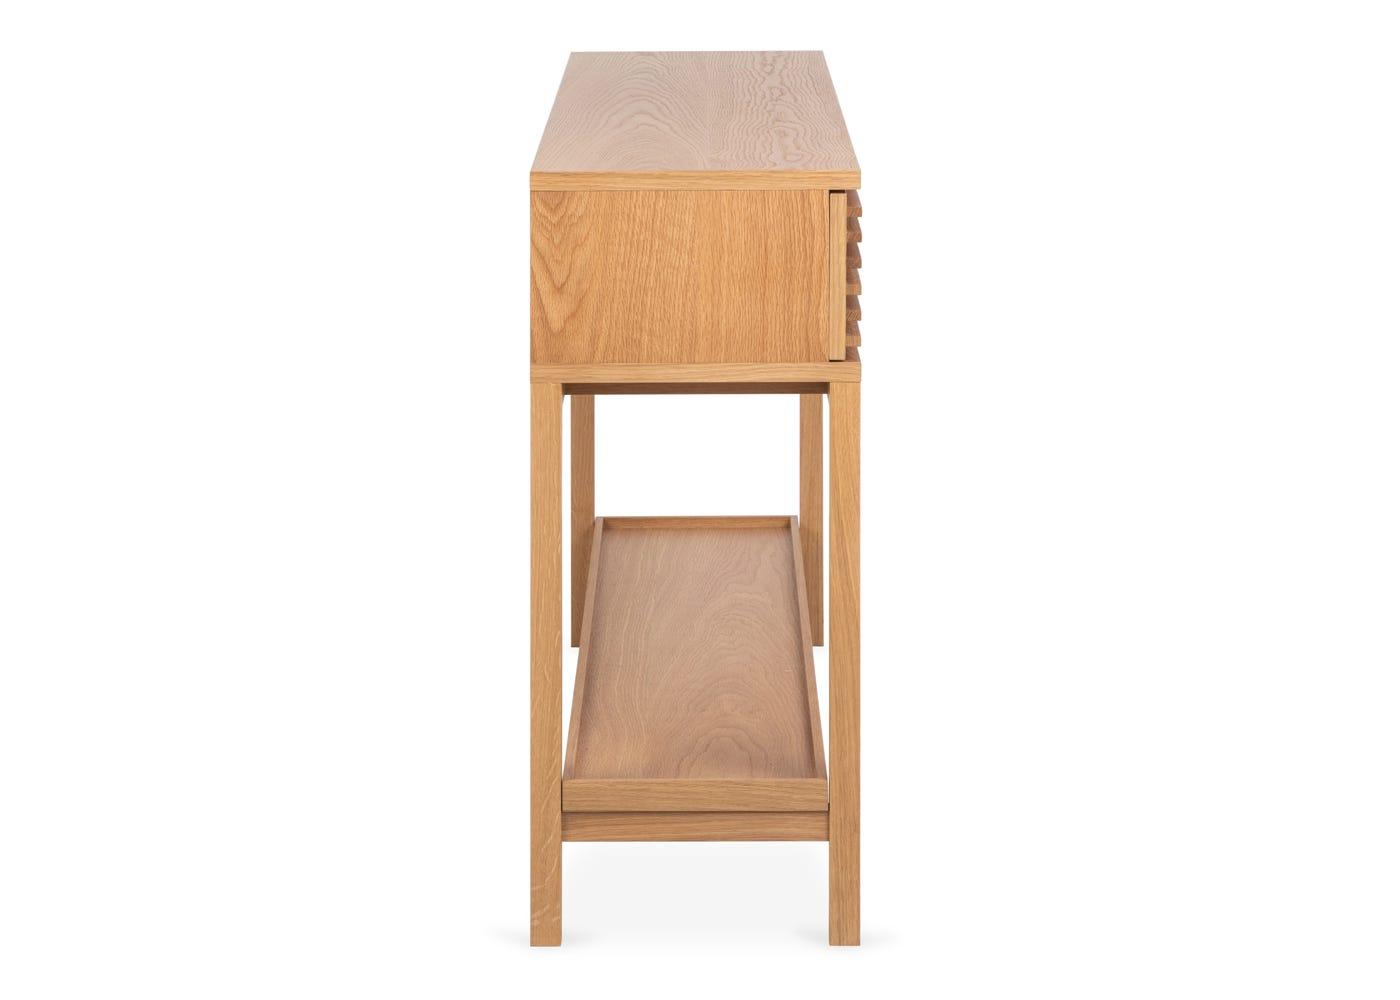 As shown: Verona oak console table - Side profile.